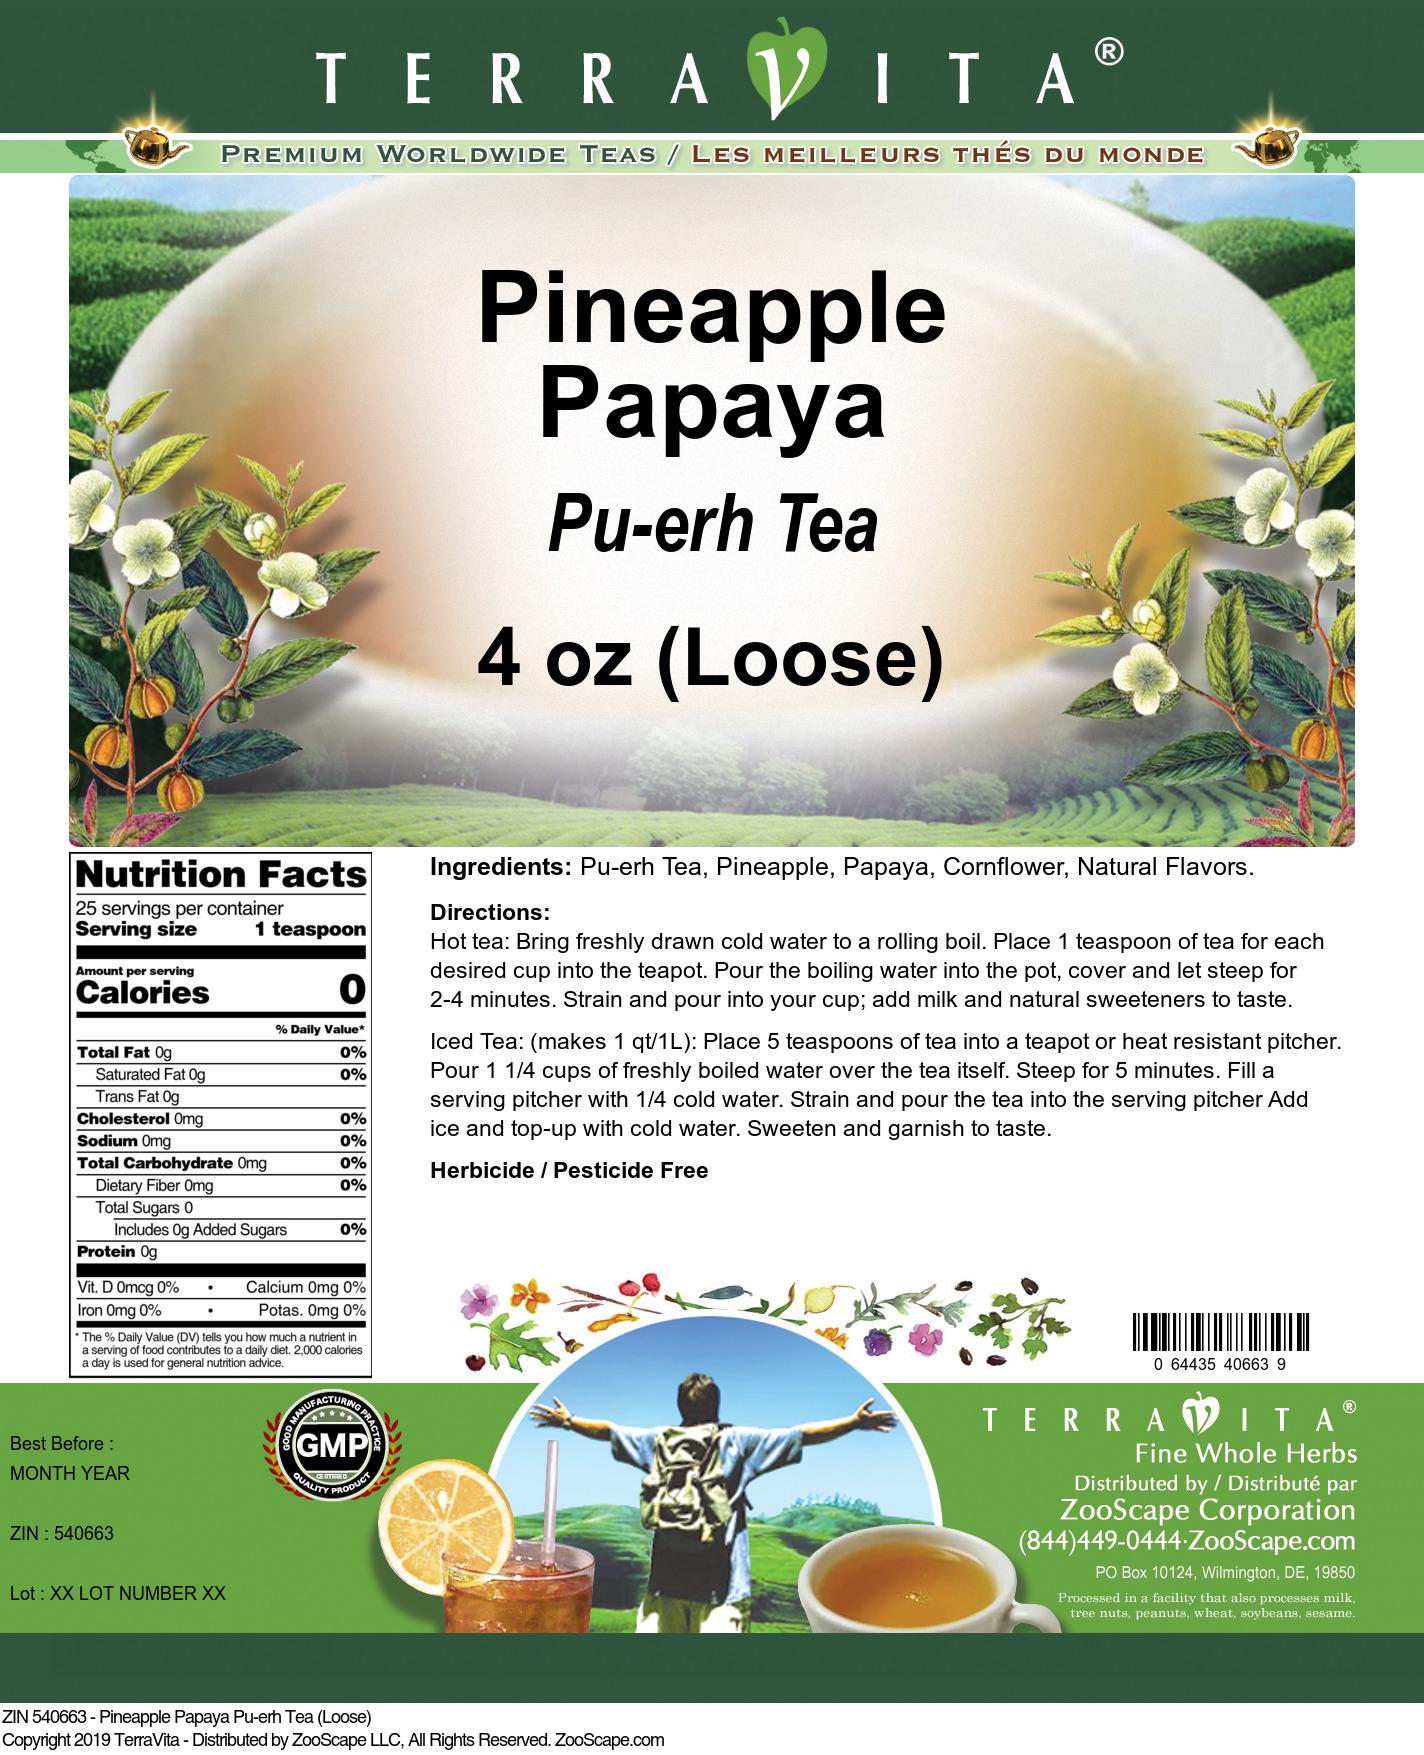 Pineapple Papaya Pu-erh Tea